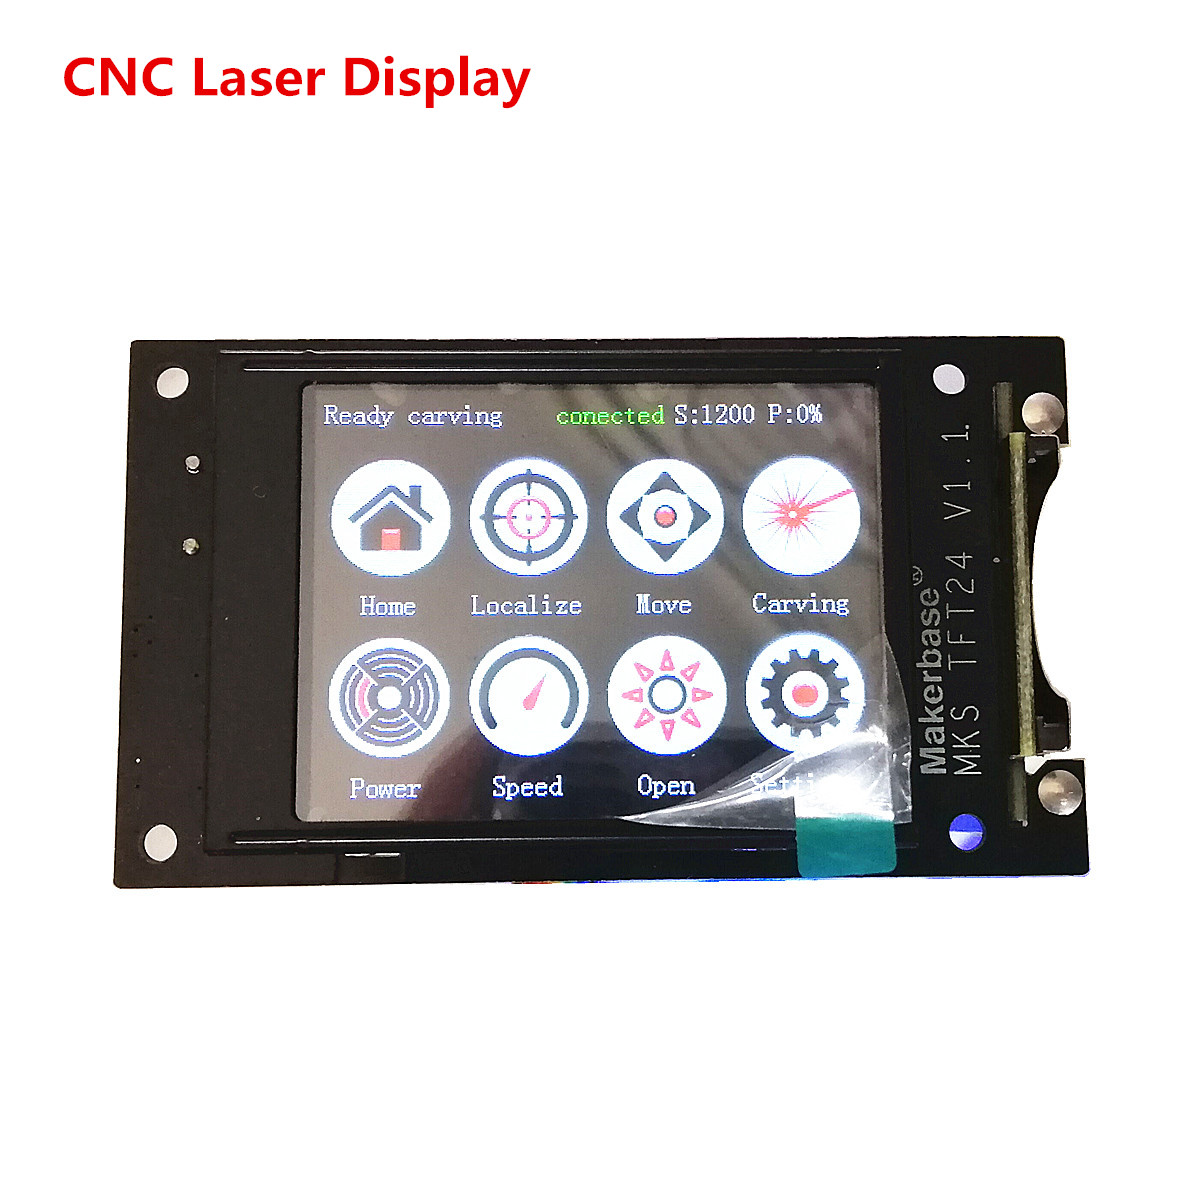 GRBL 1.1 OFFLINE Display Controller TFT24 LCD Display DIY CNC Laser Starter Parts For CNC 3018 Pro Laser Engraver Mahine